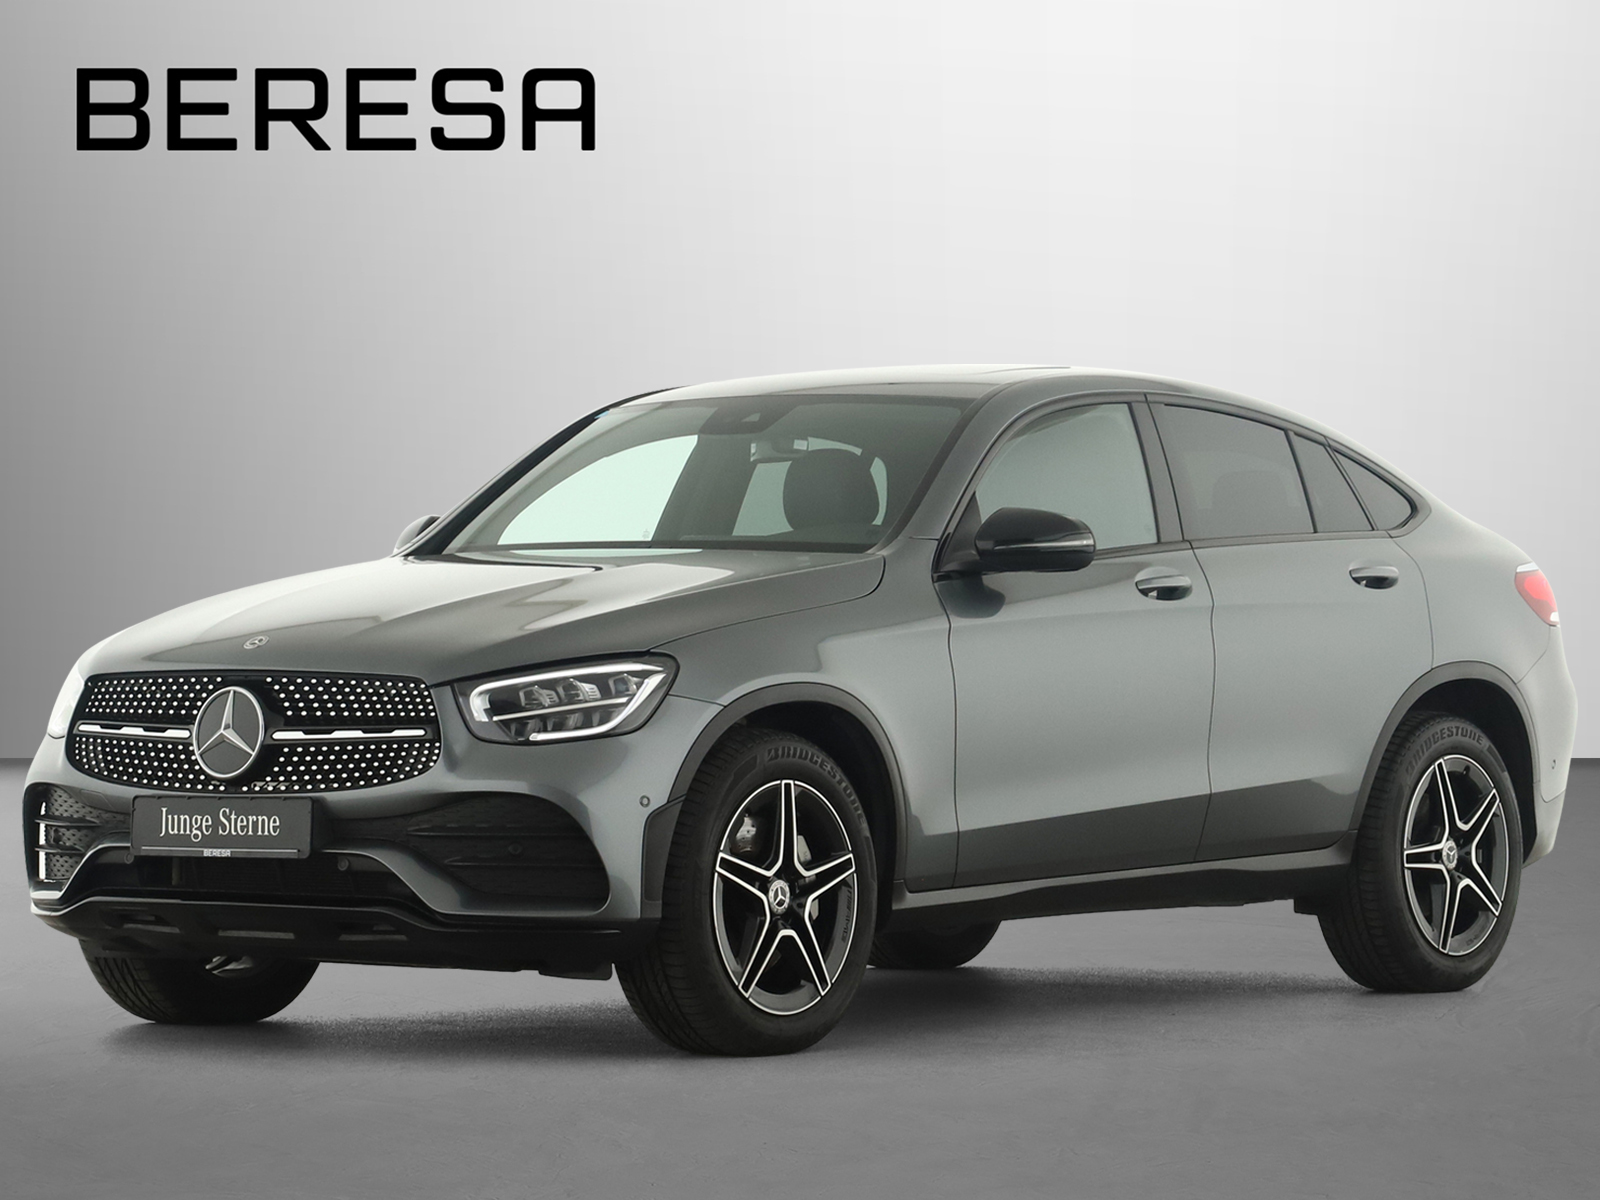 Mercedes-Benz GLC 400 d 4M Coupé AMG Spur AHK Kamera MBUX SHD, Jahr 2019, Diesel